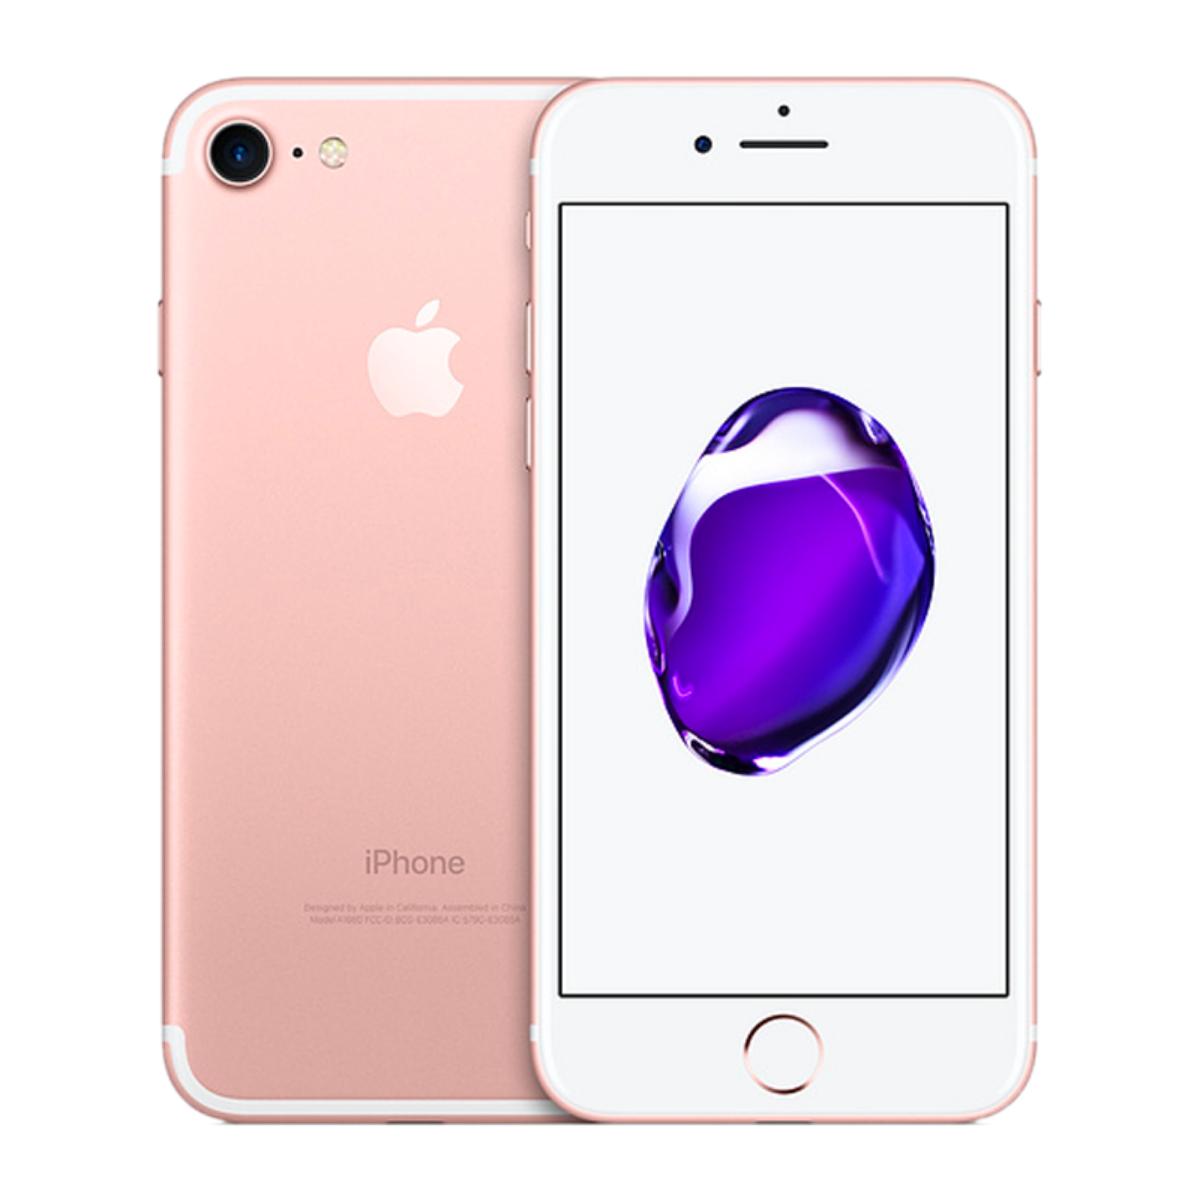 Sim Free iPhone 7 32GB Unlocked Mobile Phone - Rose Gold